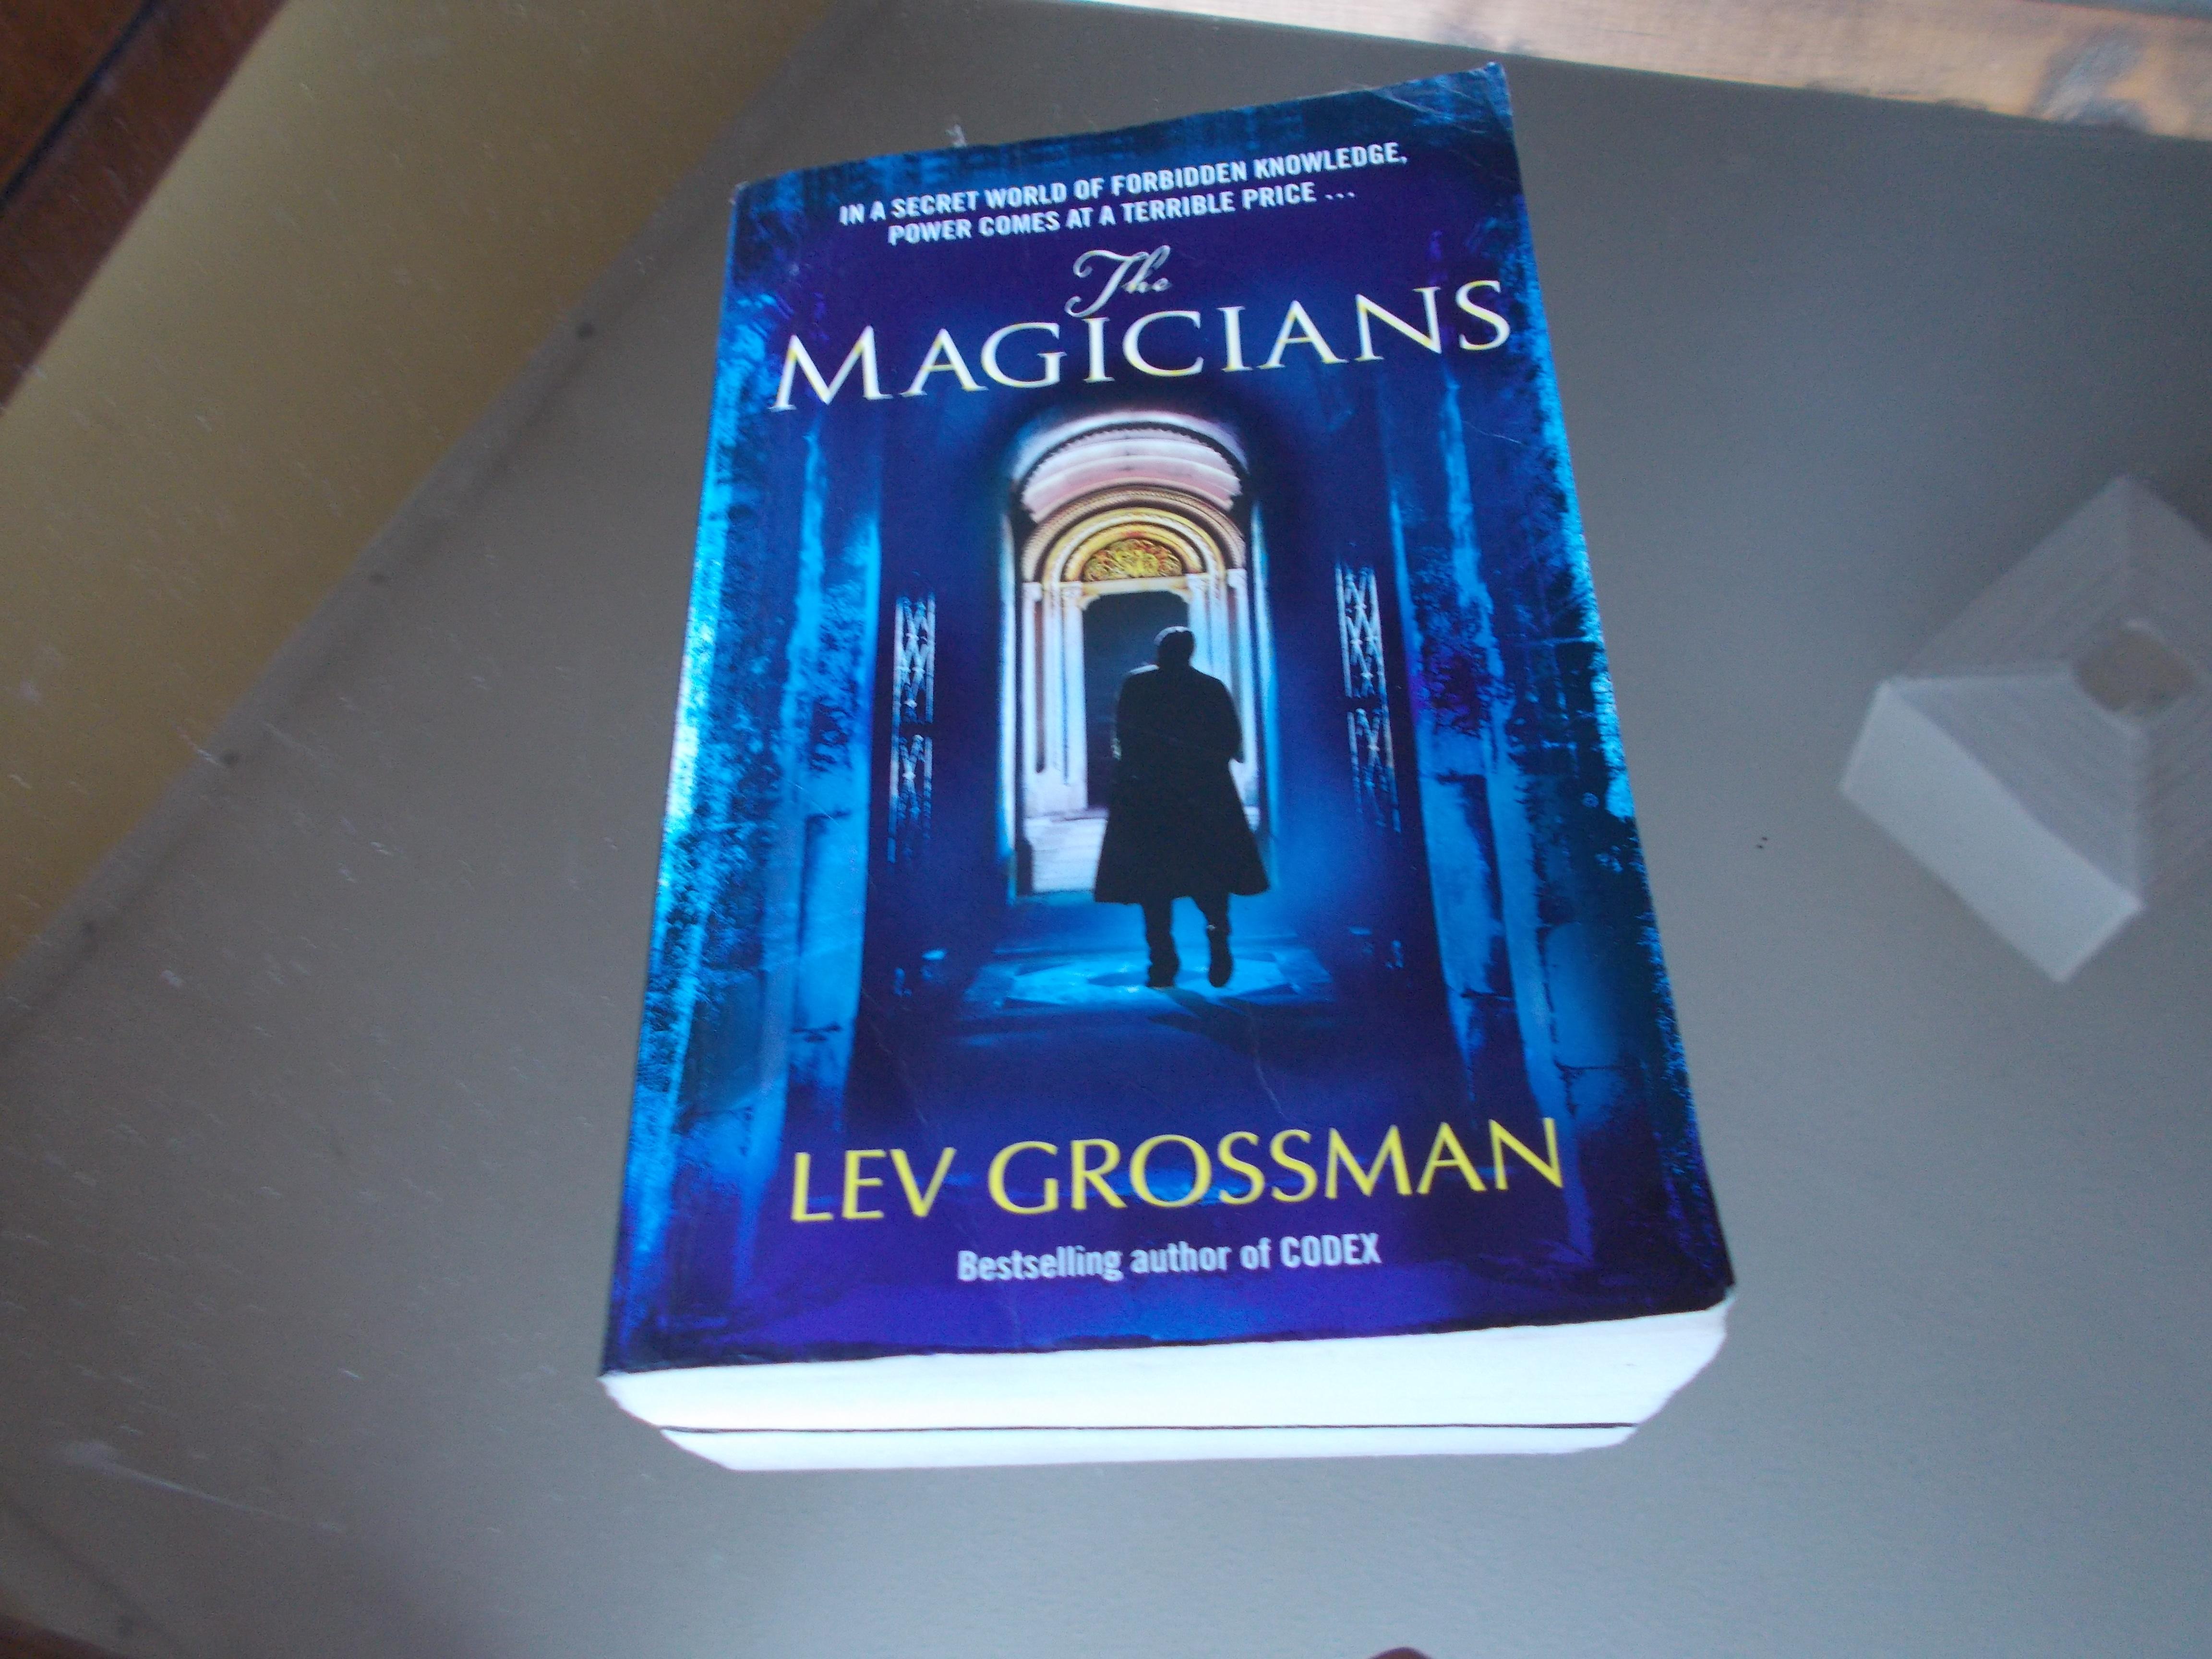 The Magicians, Lev Grossman, 2009, paperback.